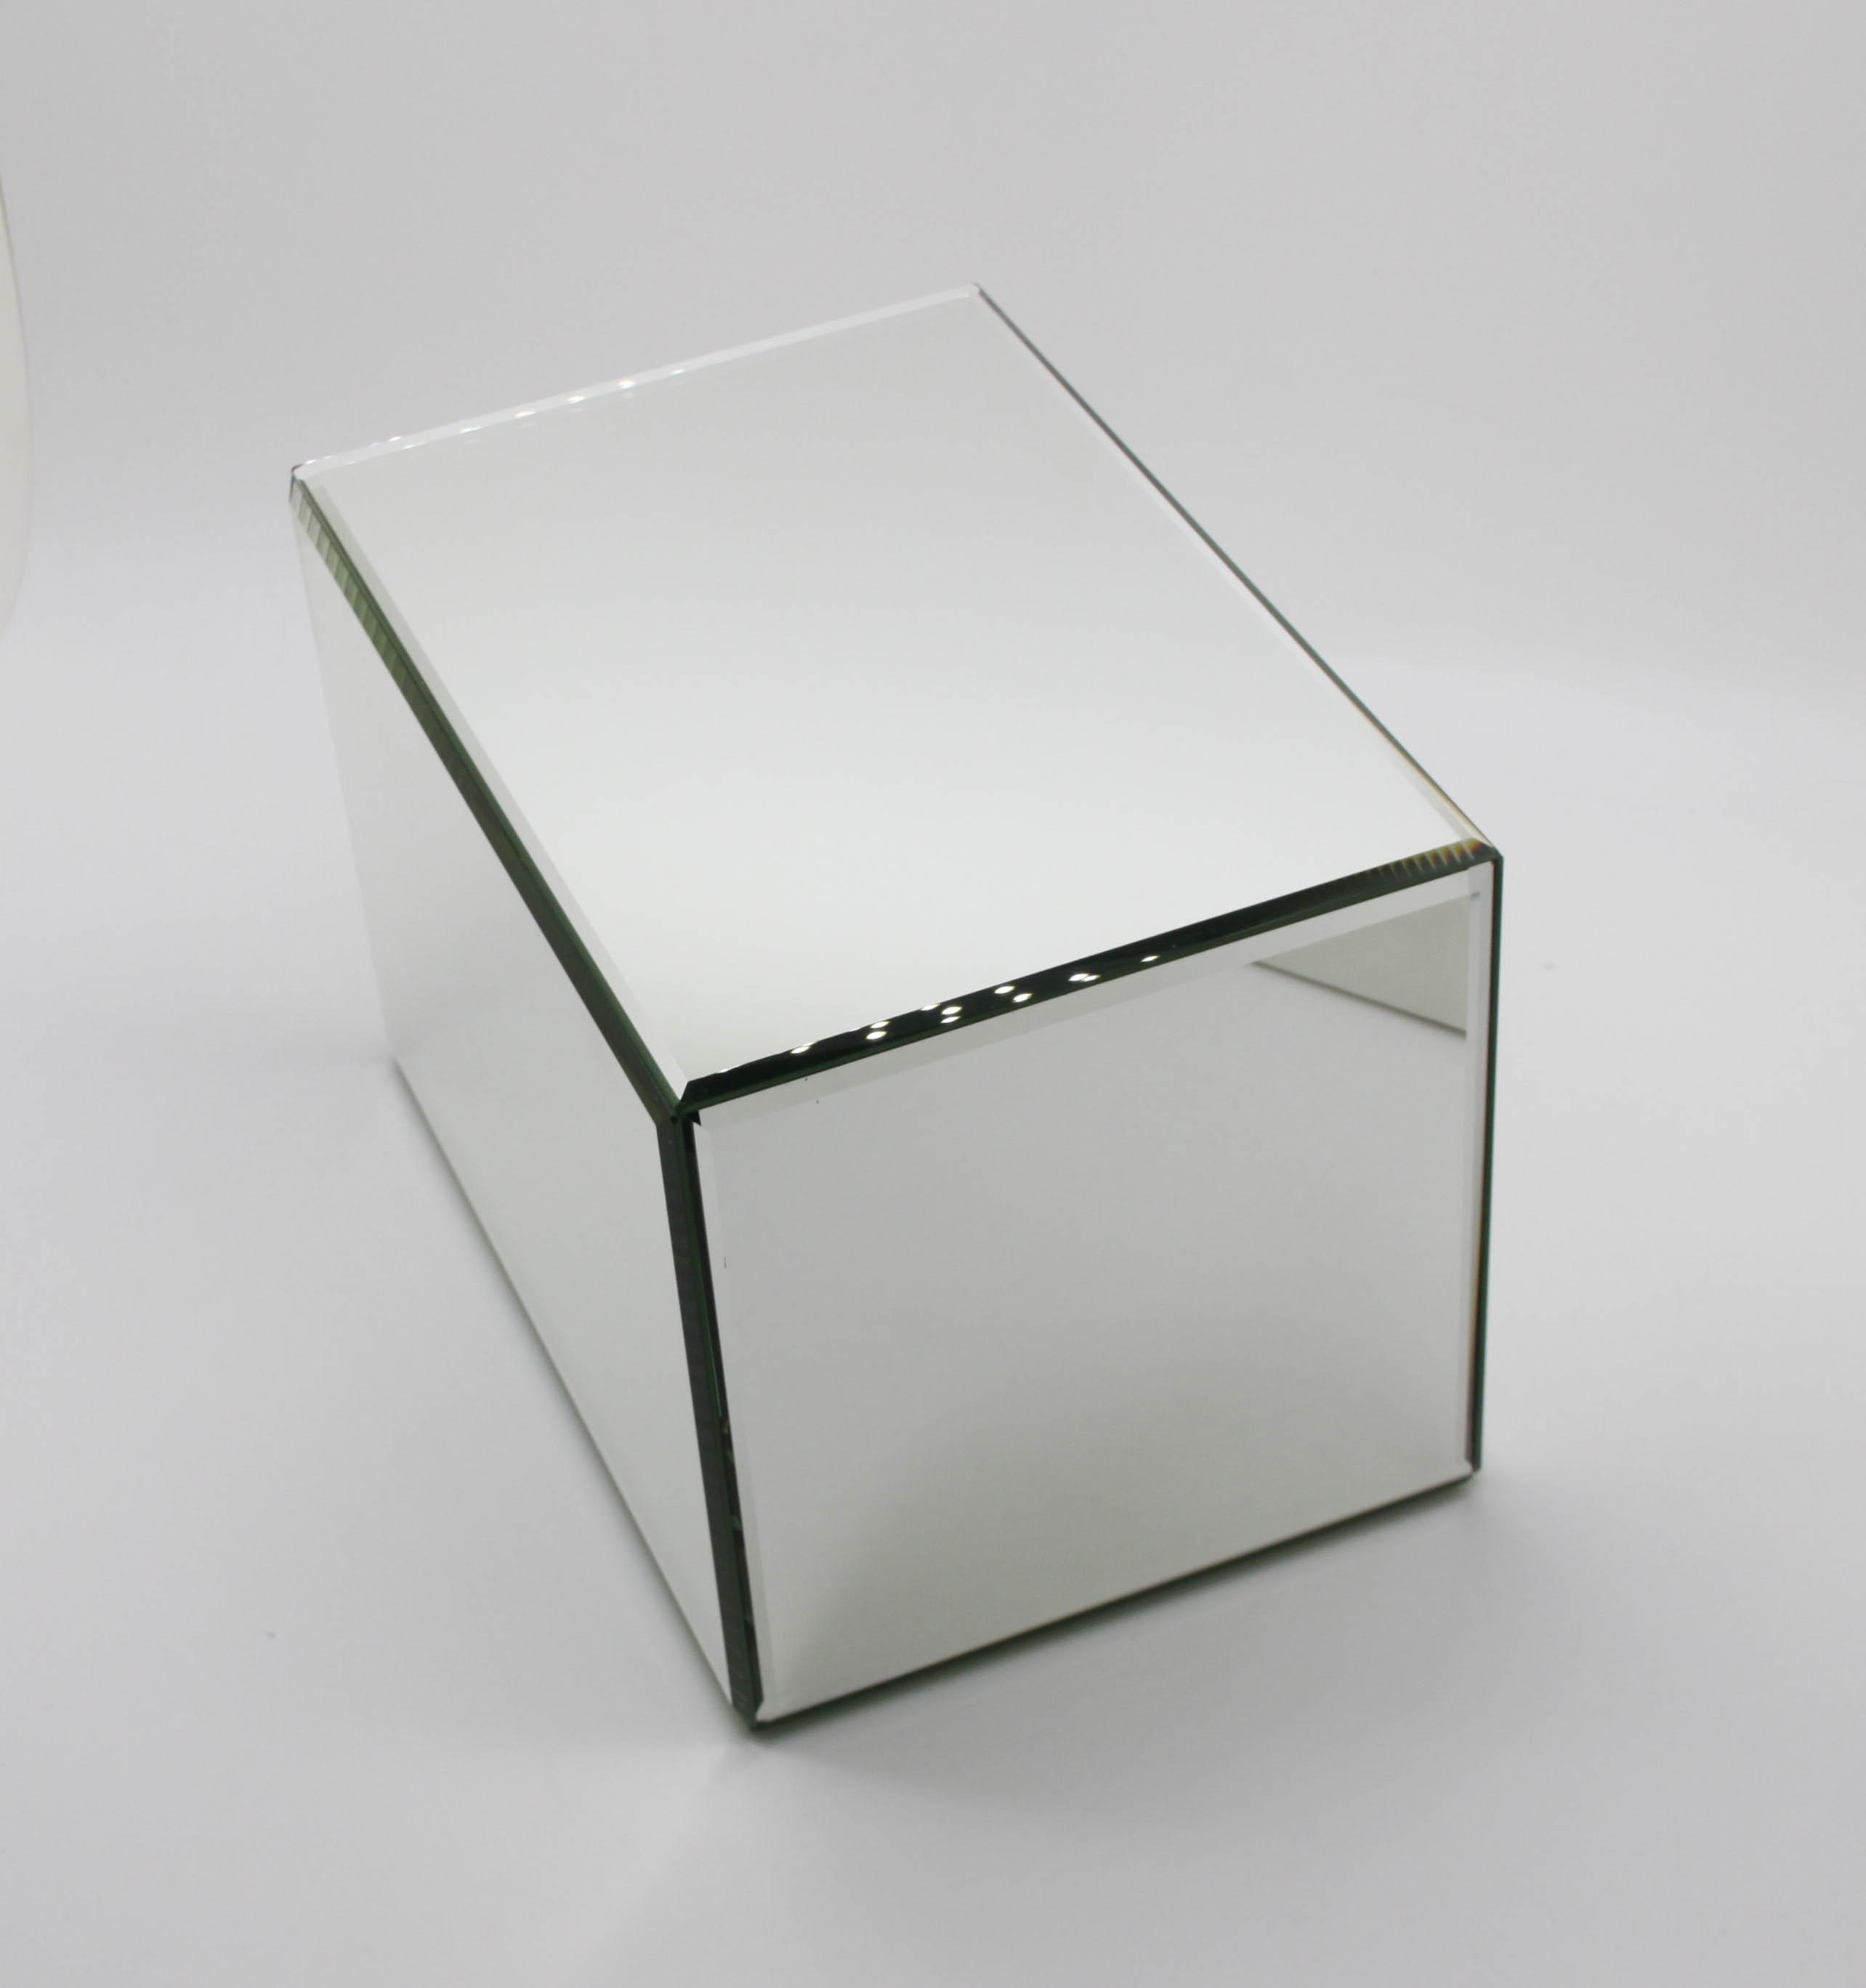 Fixture Displays 10 25x7x7 Quot Rectangular Glass Mirror